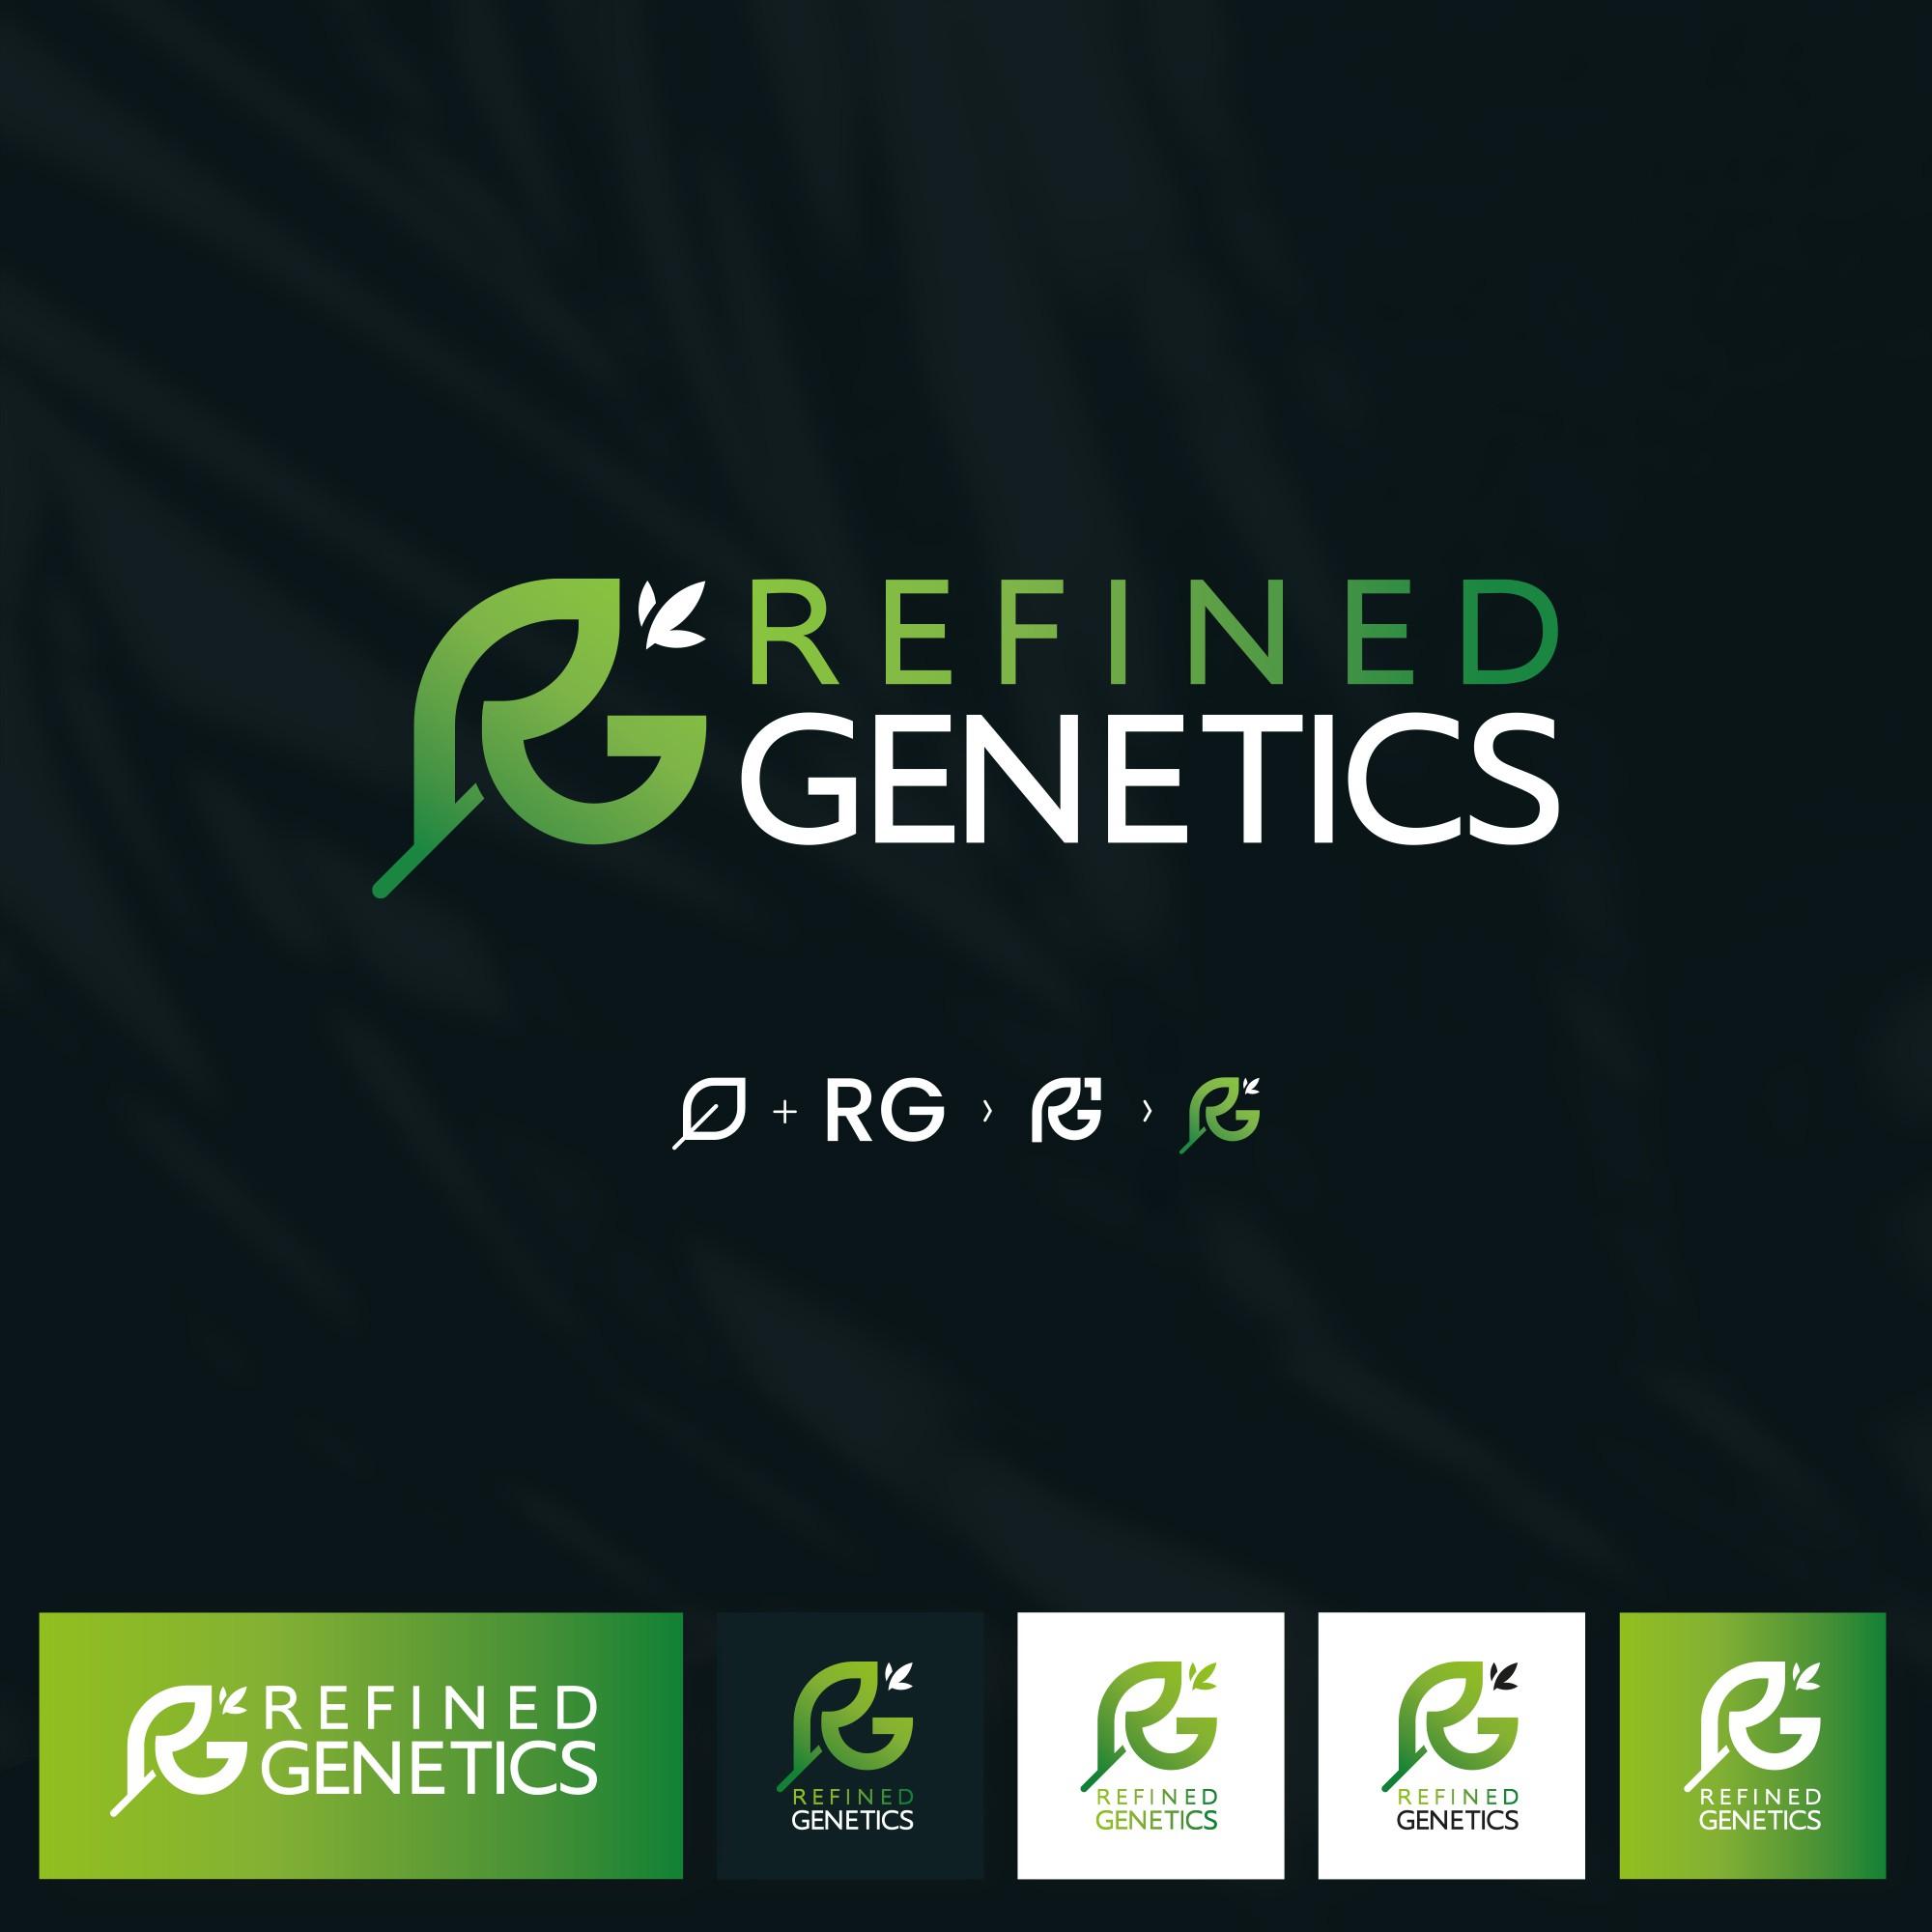 Design a logo for a cutting edge cannabis genetics company